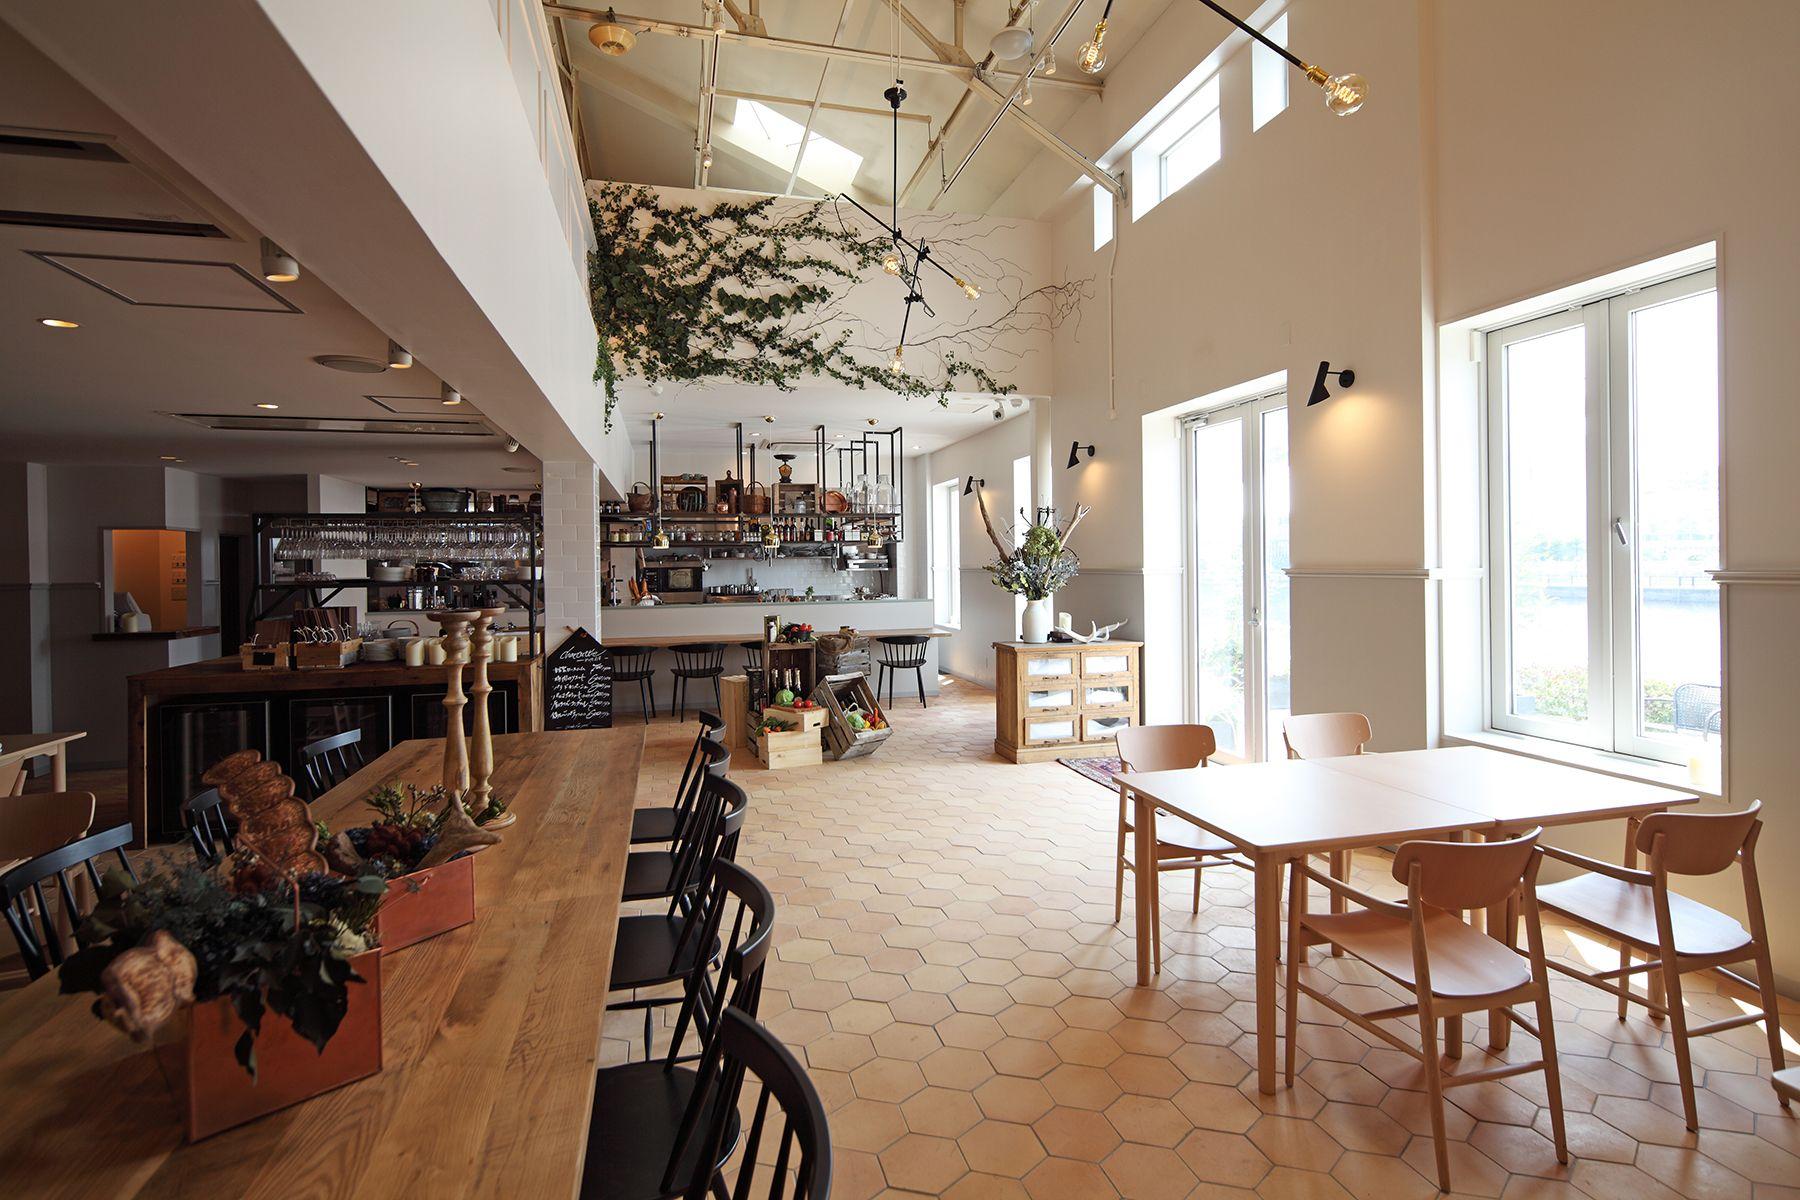 SLOW HOUSE Studio (スローハウス スタジオ SHOP/RESTAURANT)レストラン